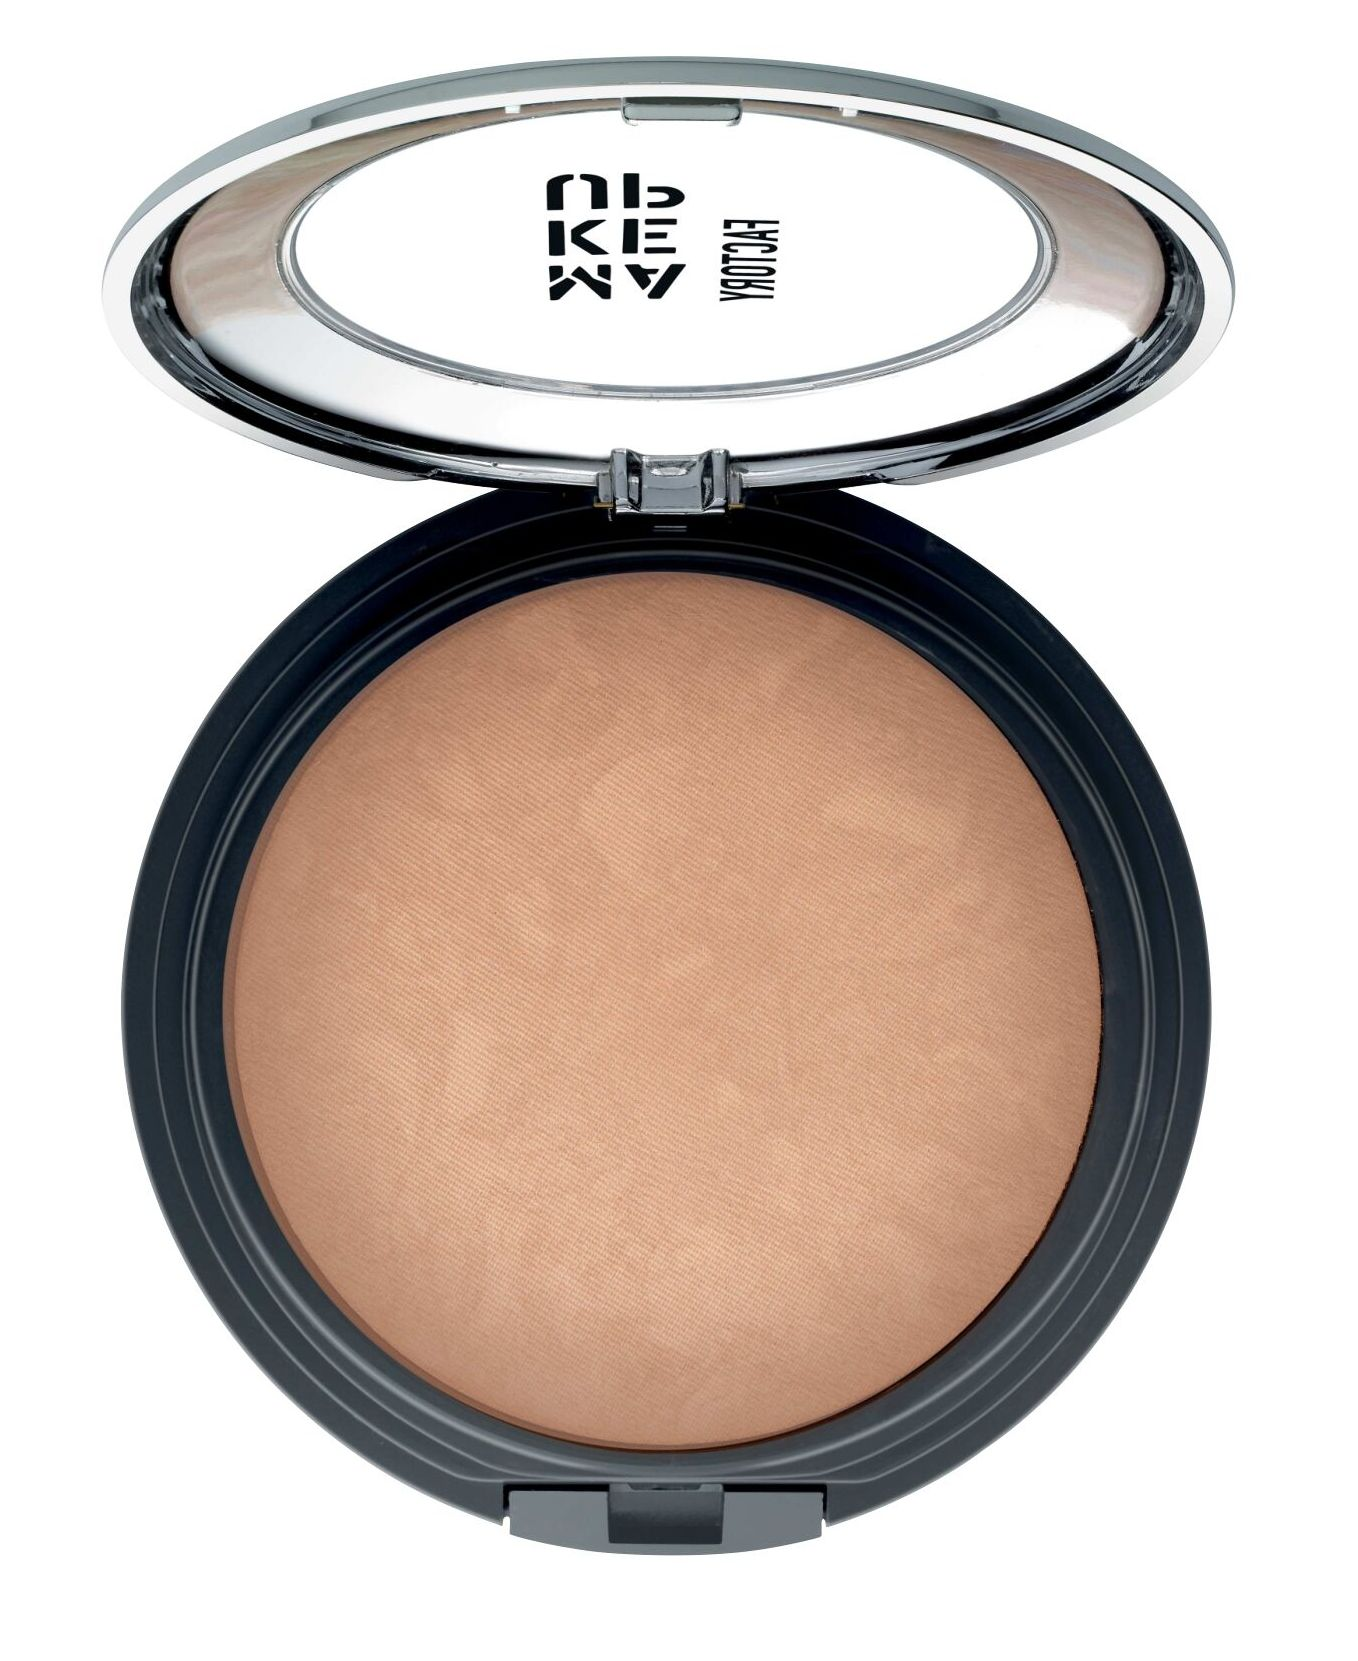 MAKE UP FACTORY Пудра запеченная бронзирующая с эффектом сияния, 10 песчаная дюна / Touch of Tan Bronzer 9,5 г фото